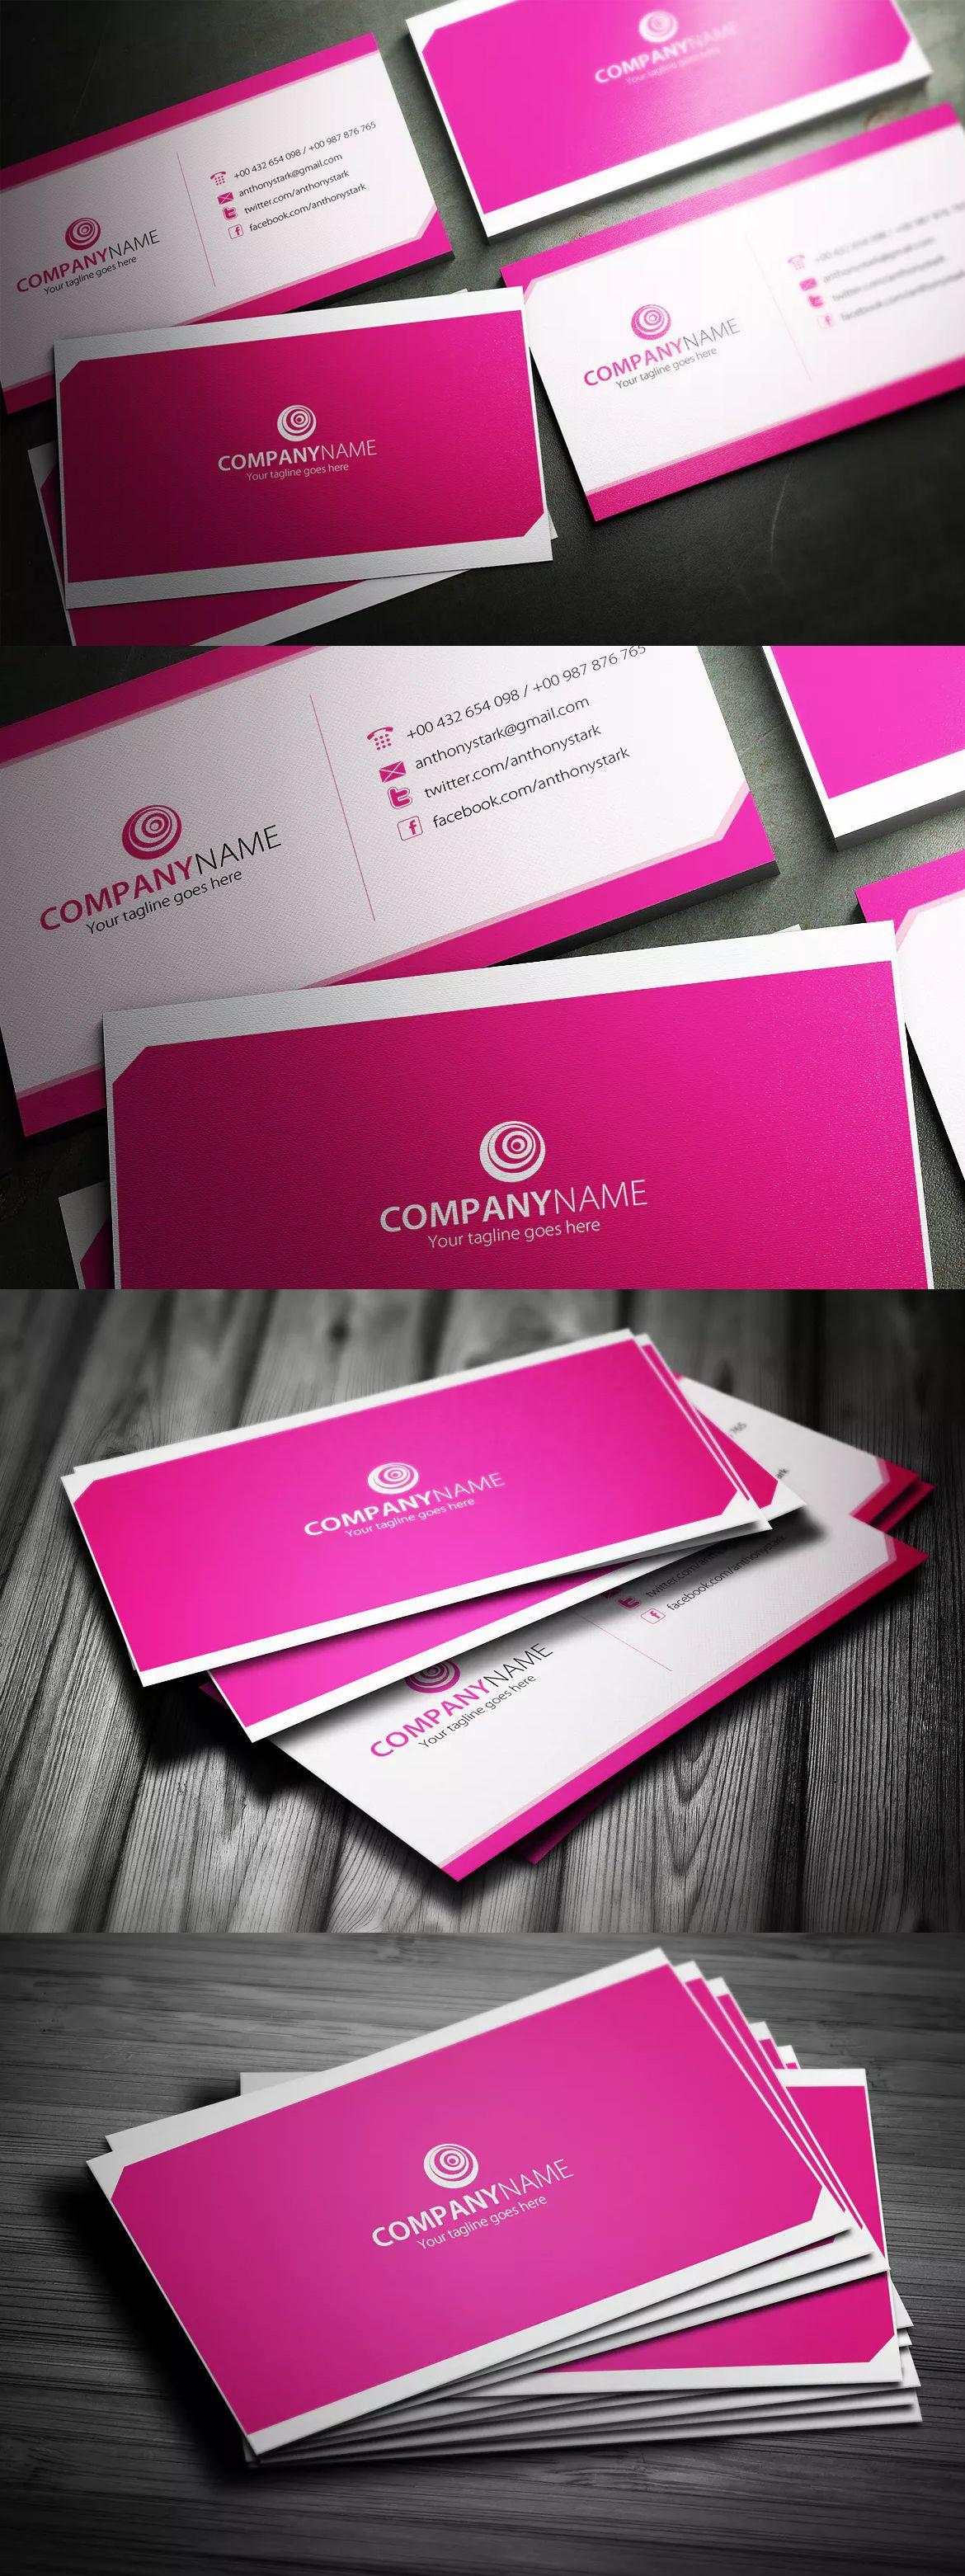 Pink Business Card Design Template PSD